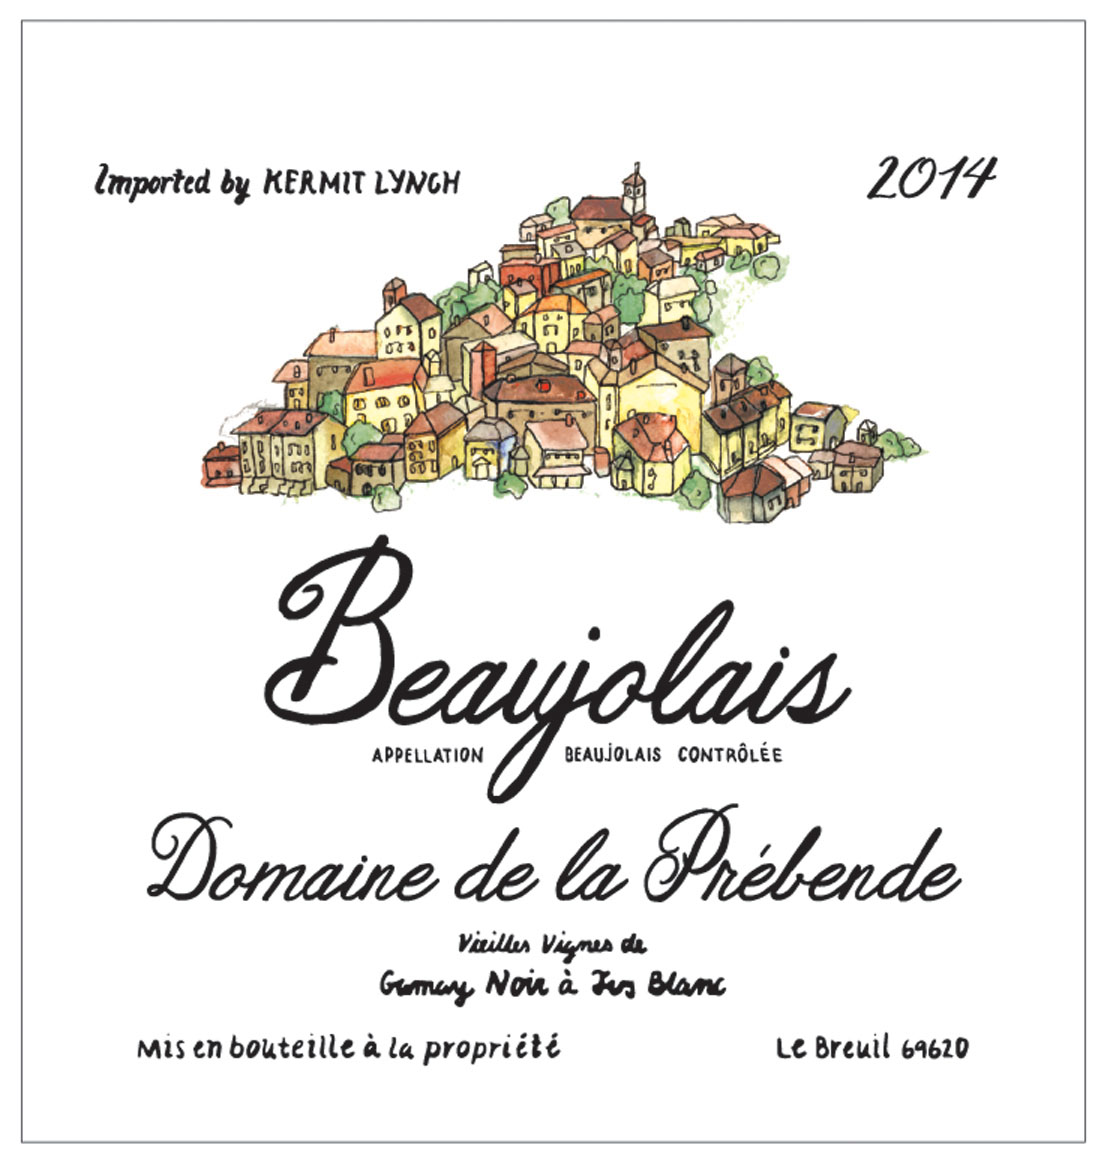 Prebende_Beaujolais_14_hi_res.jpg